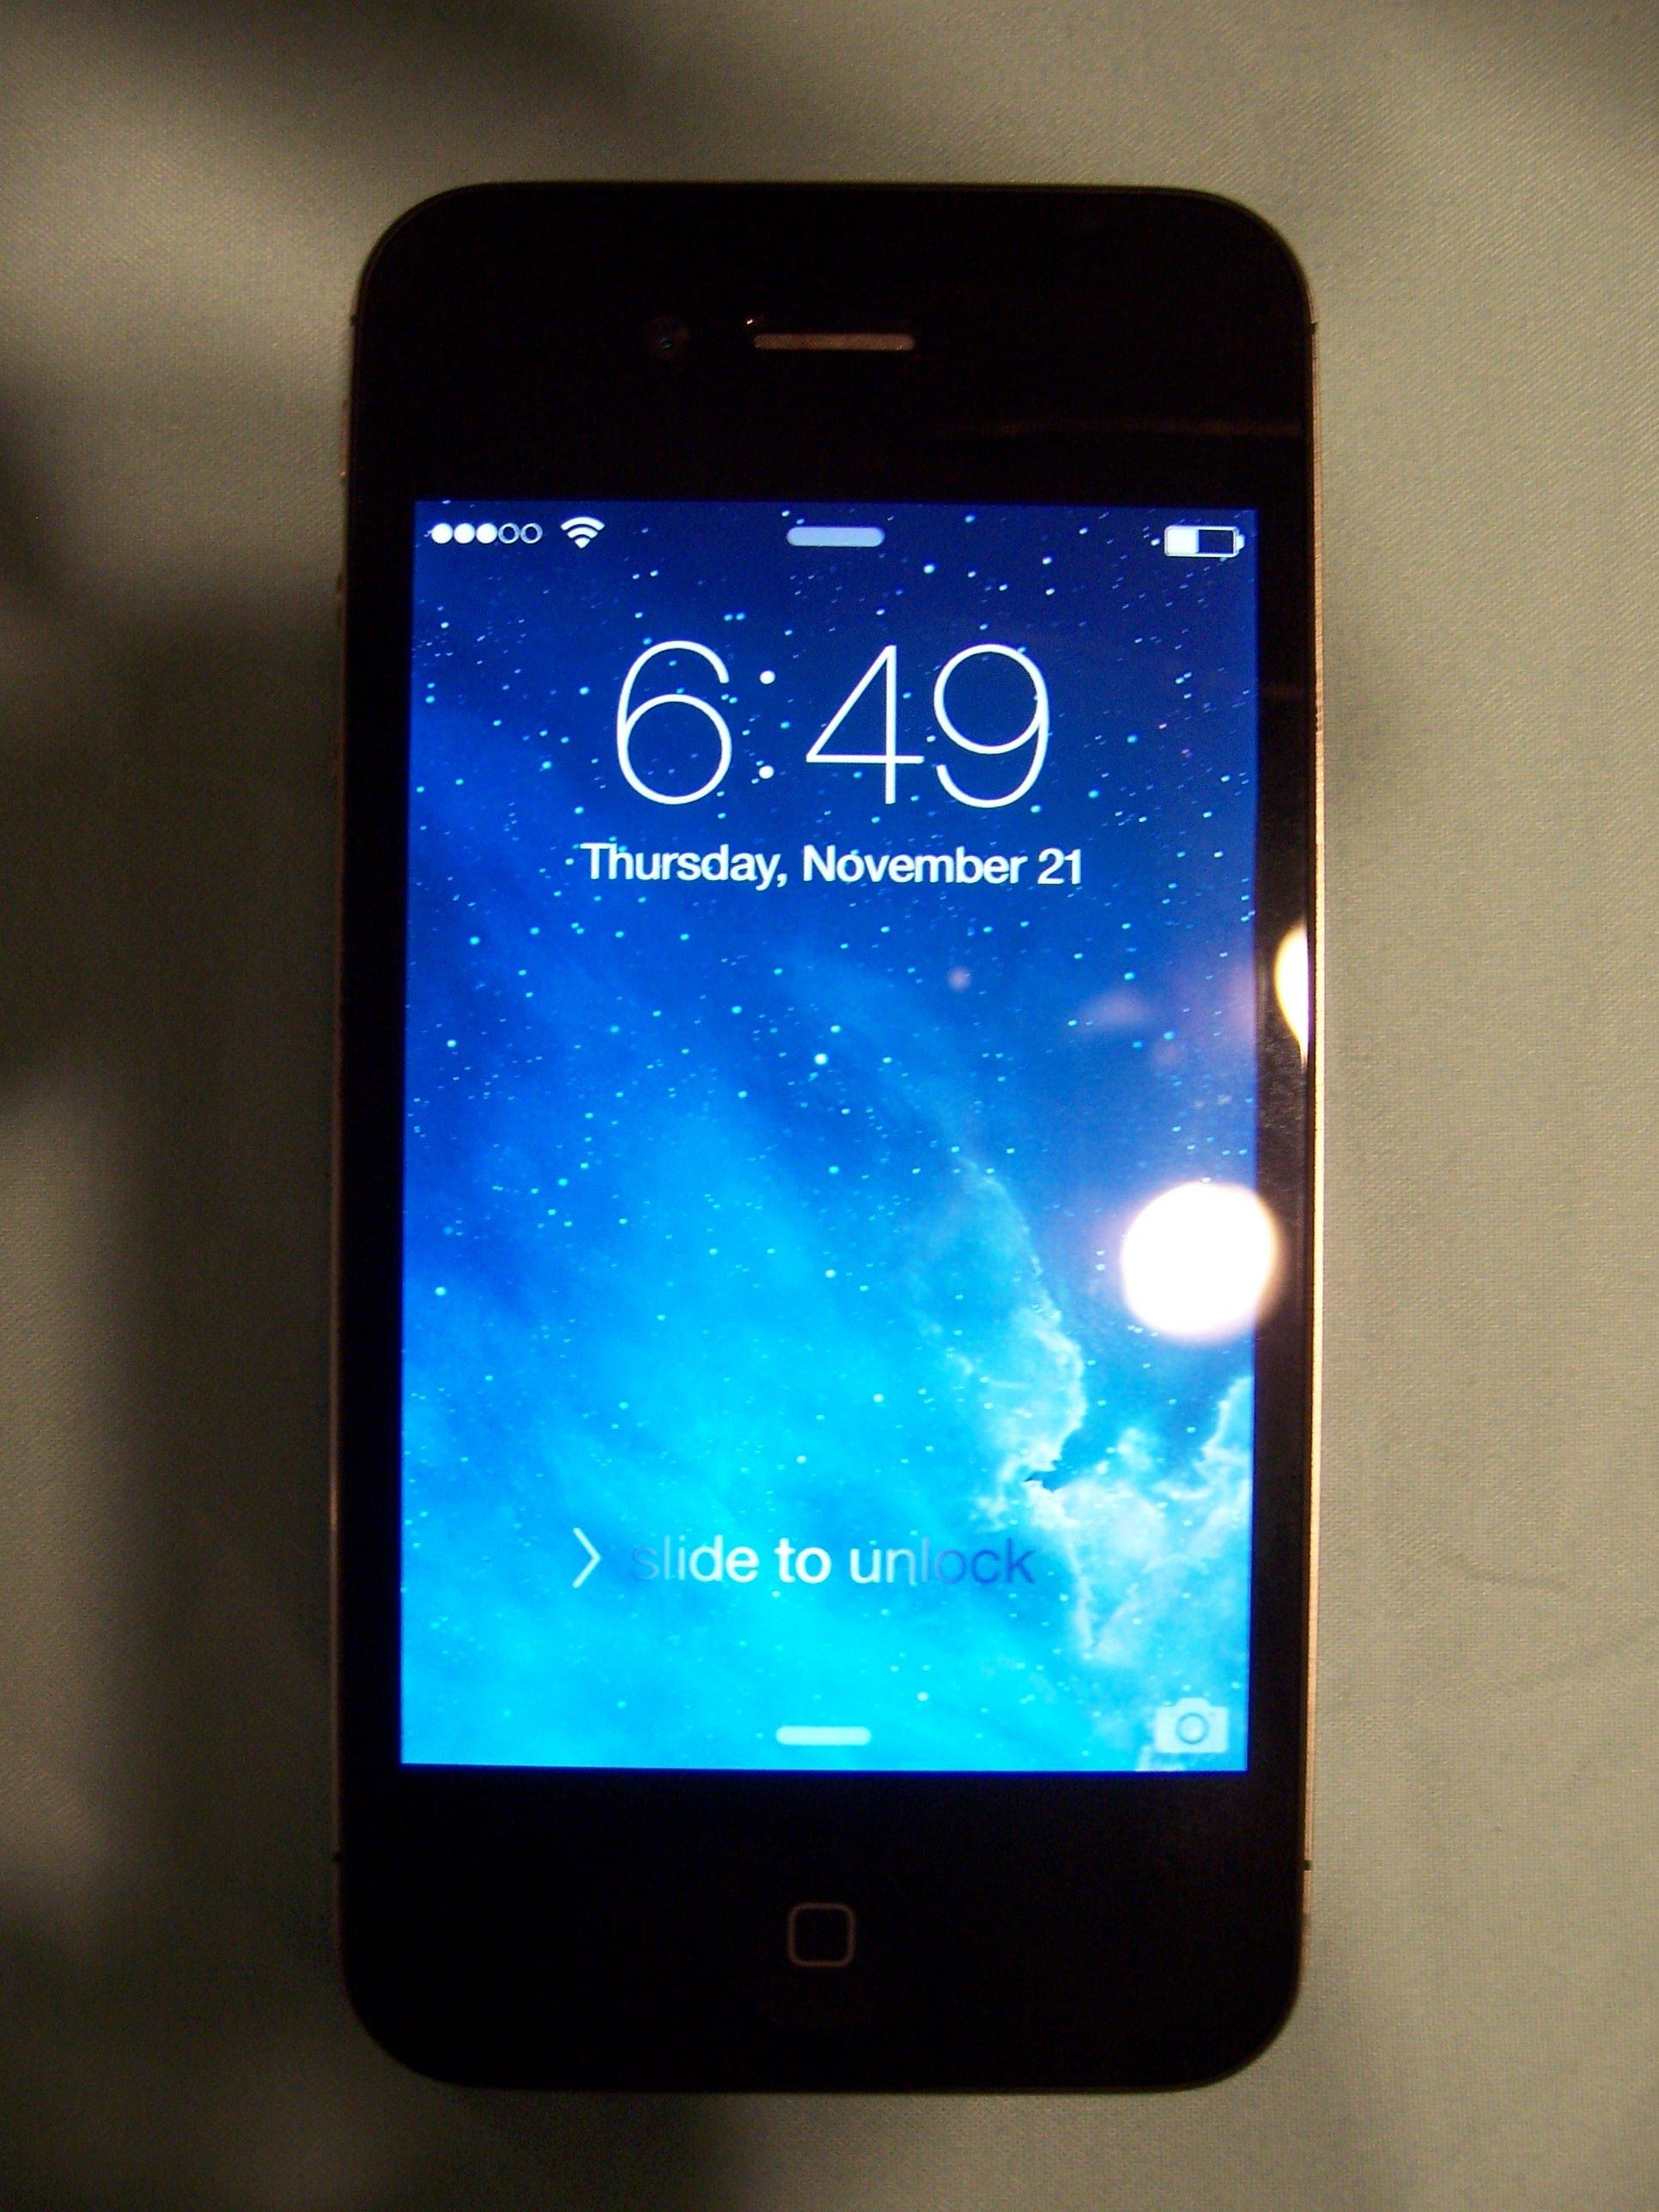 Apple iPhone 4 - 32GB - Black (Verizon) Smartphone - YouTube